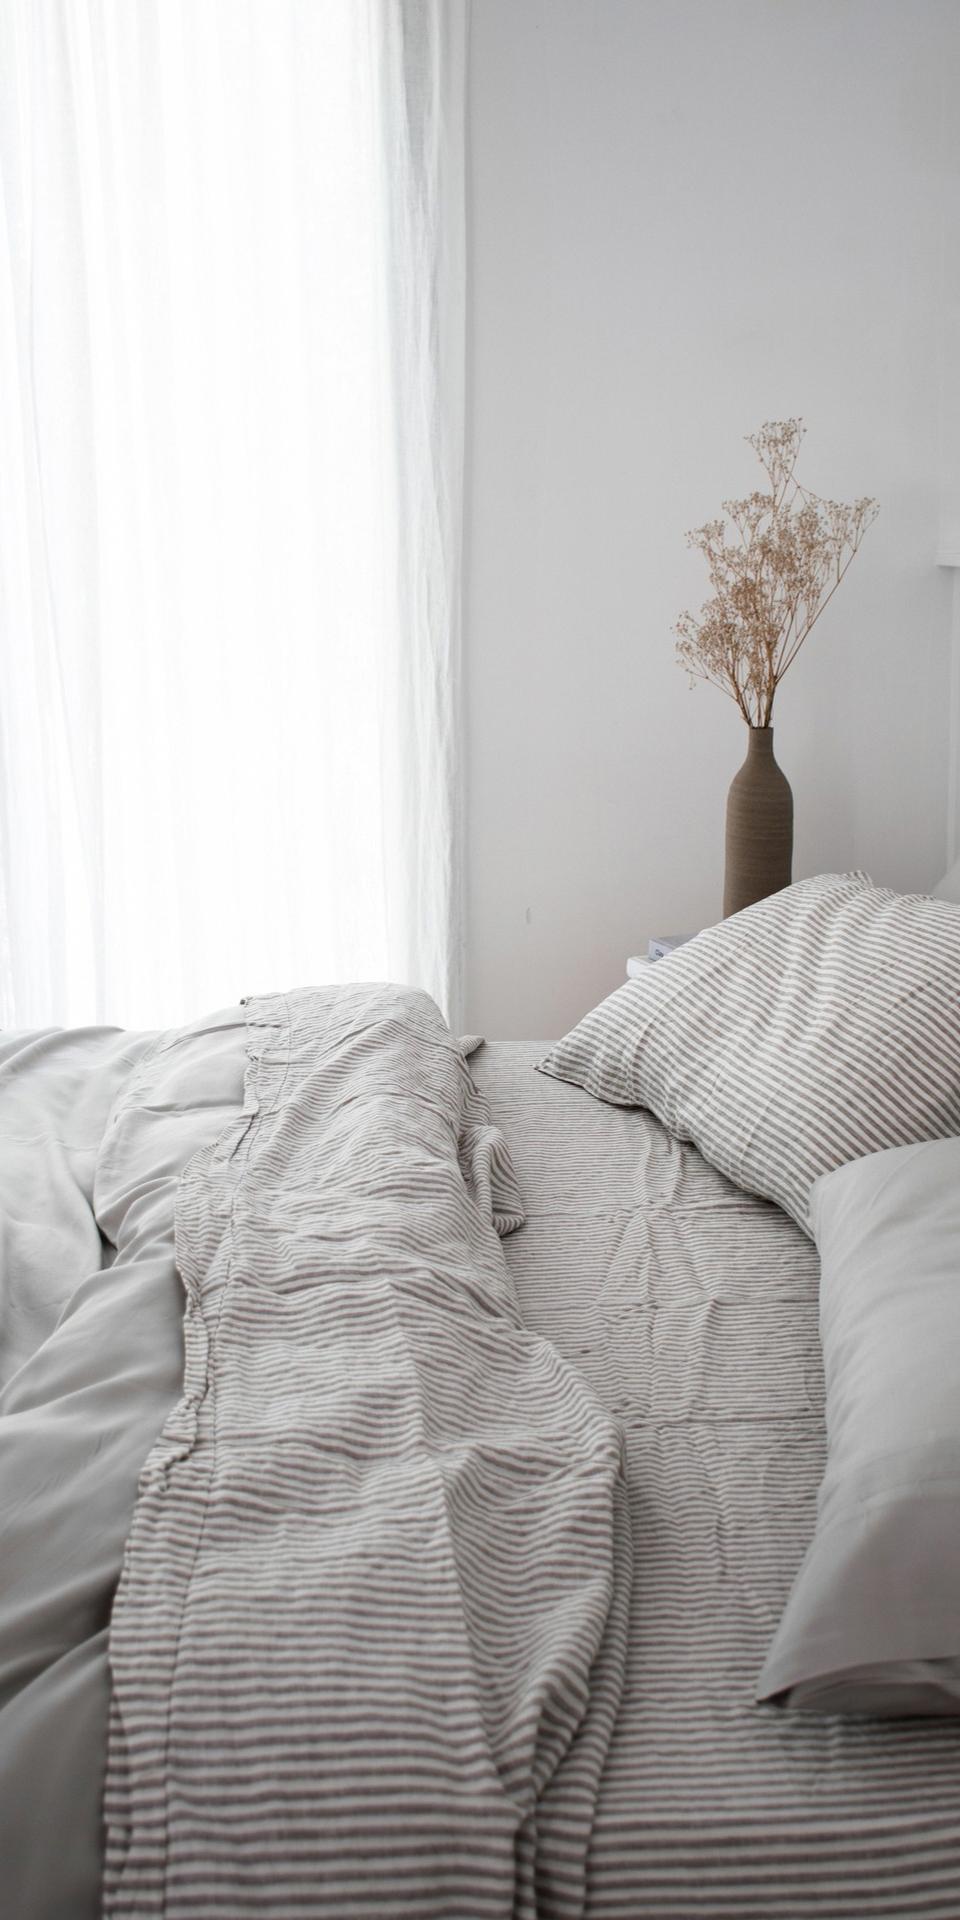 Ultra Luxurious 100 Pure French Linen Sheet Set In Soft Grey Stripes Bettideenschlafzi In 2020 Luxusschlafzimmer Schlafzimmer Inspirationen Schlafzimmer Einrichten